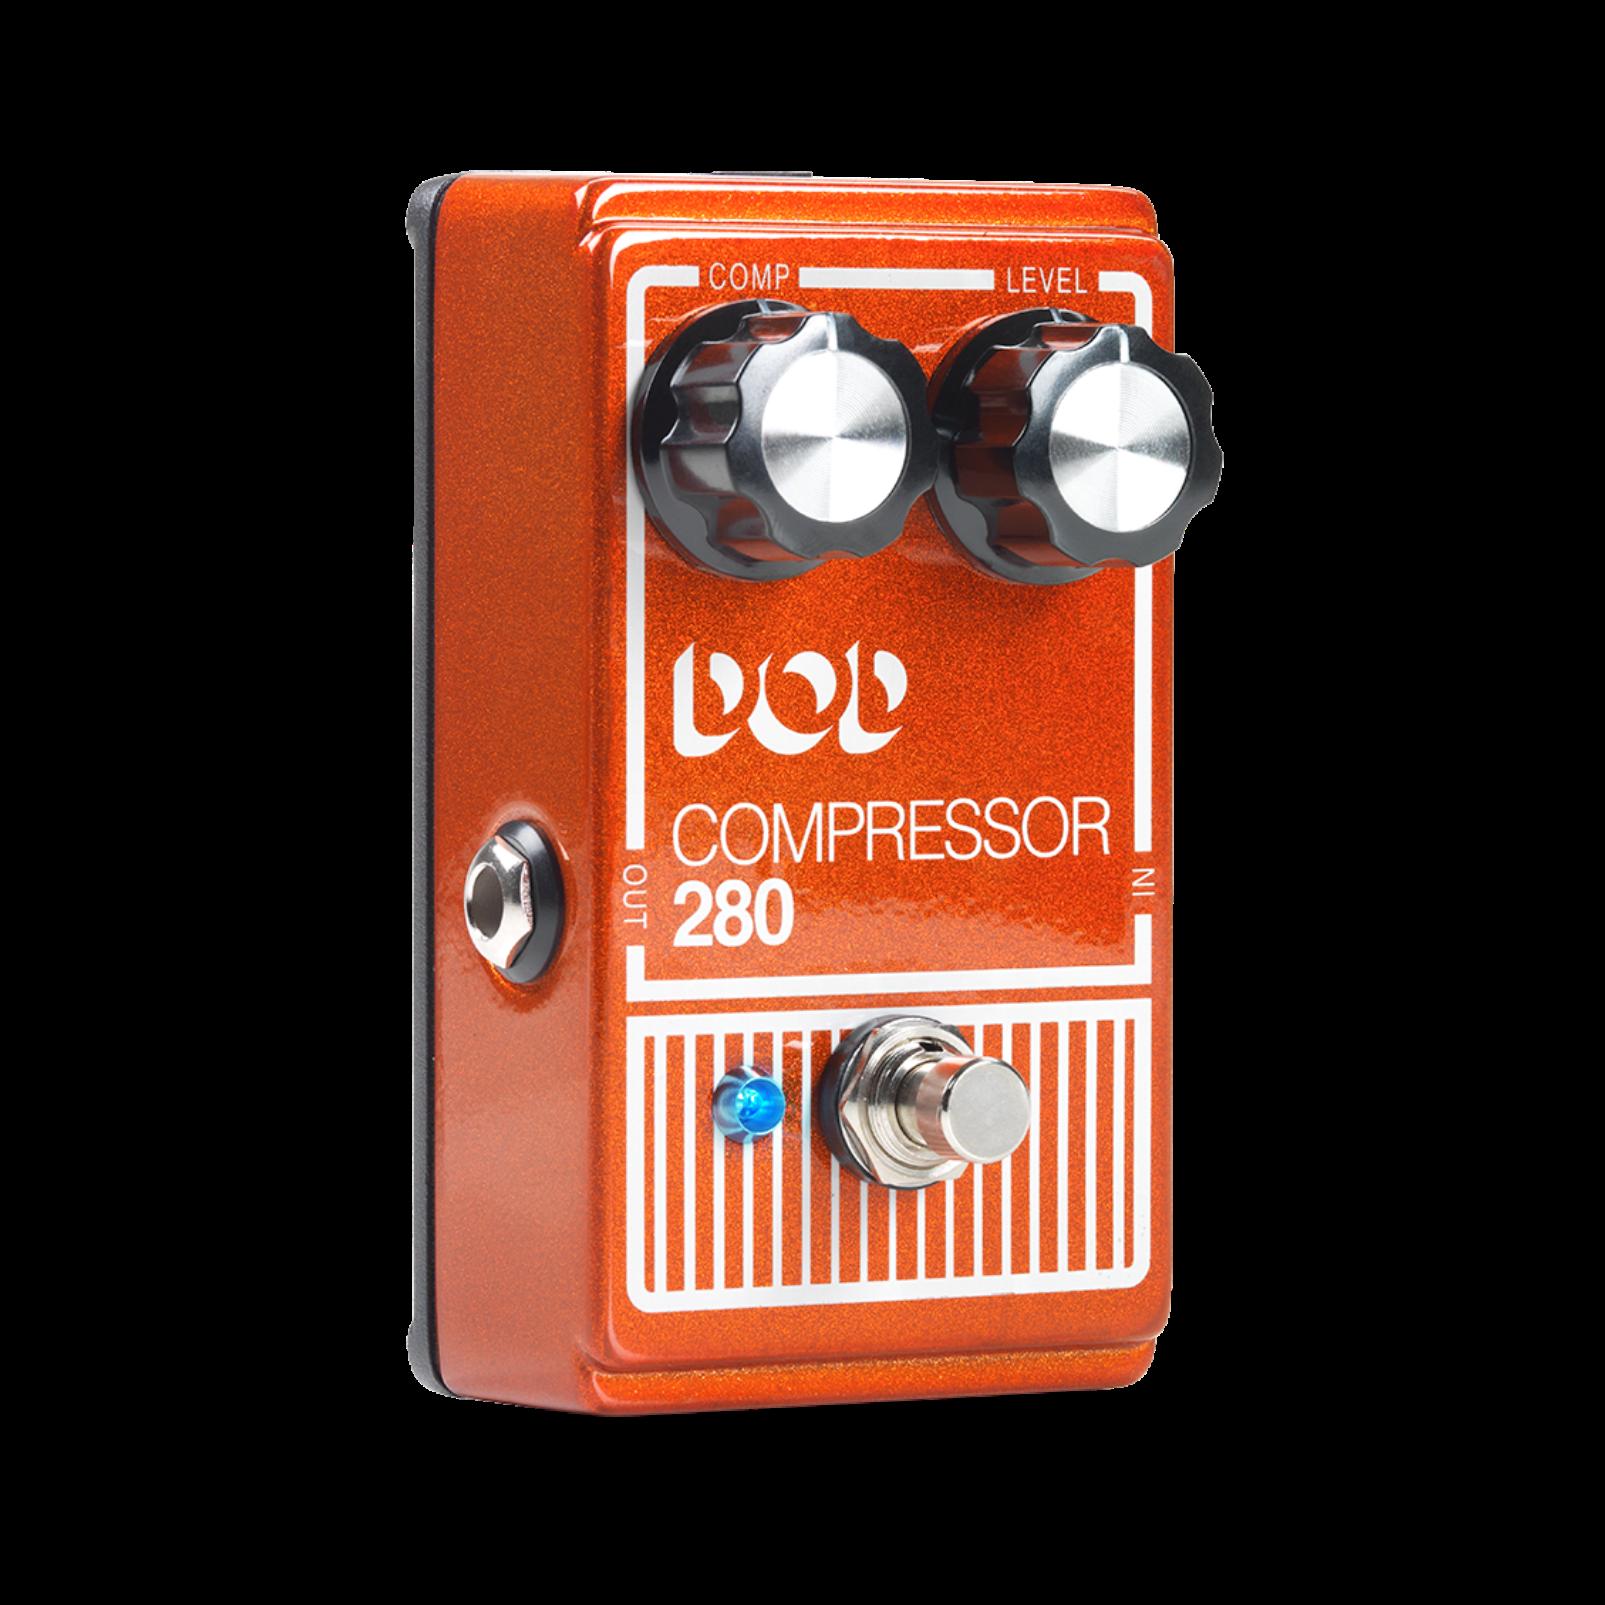 Compressor 280